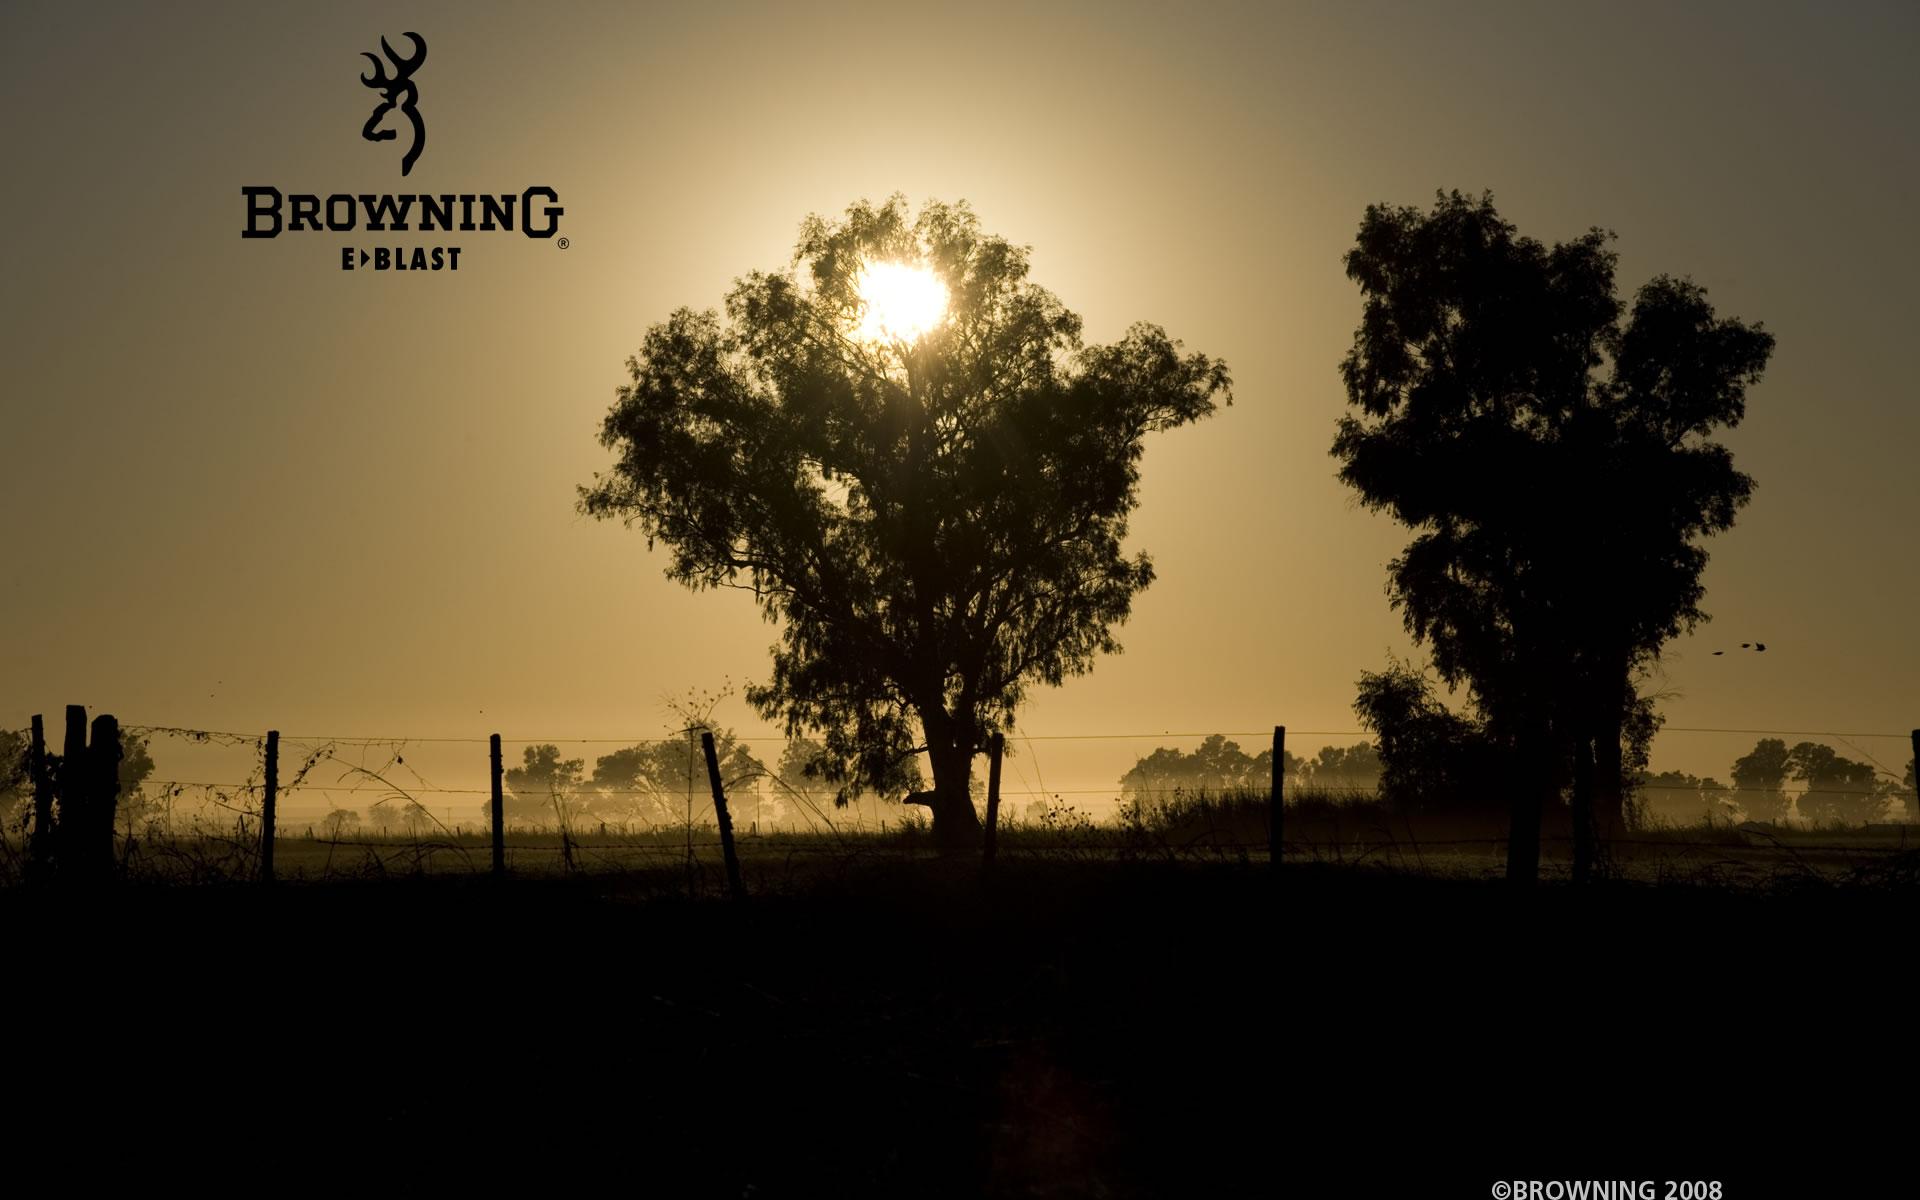 Browning Browning Browning Logo and Browning Symbol 1920x1200